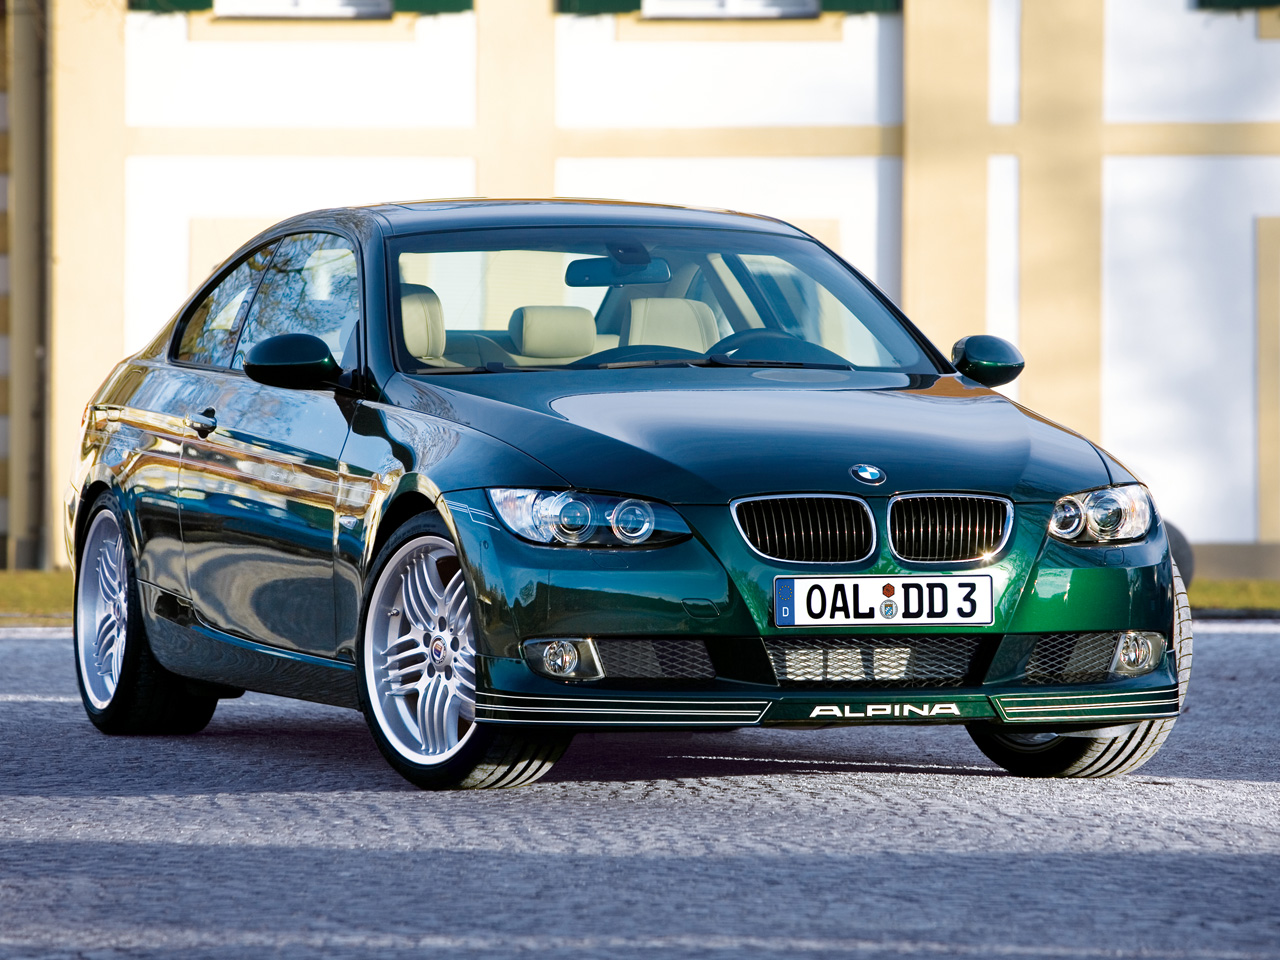 Bmw-alpina-d3-bi-turbo-coupe-img 3-1-